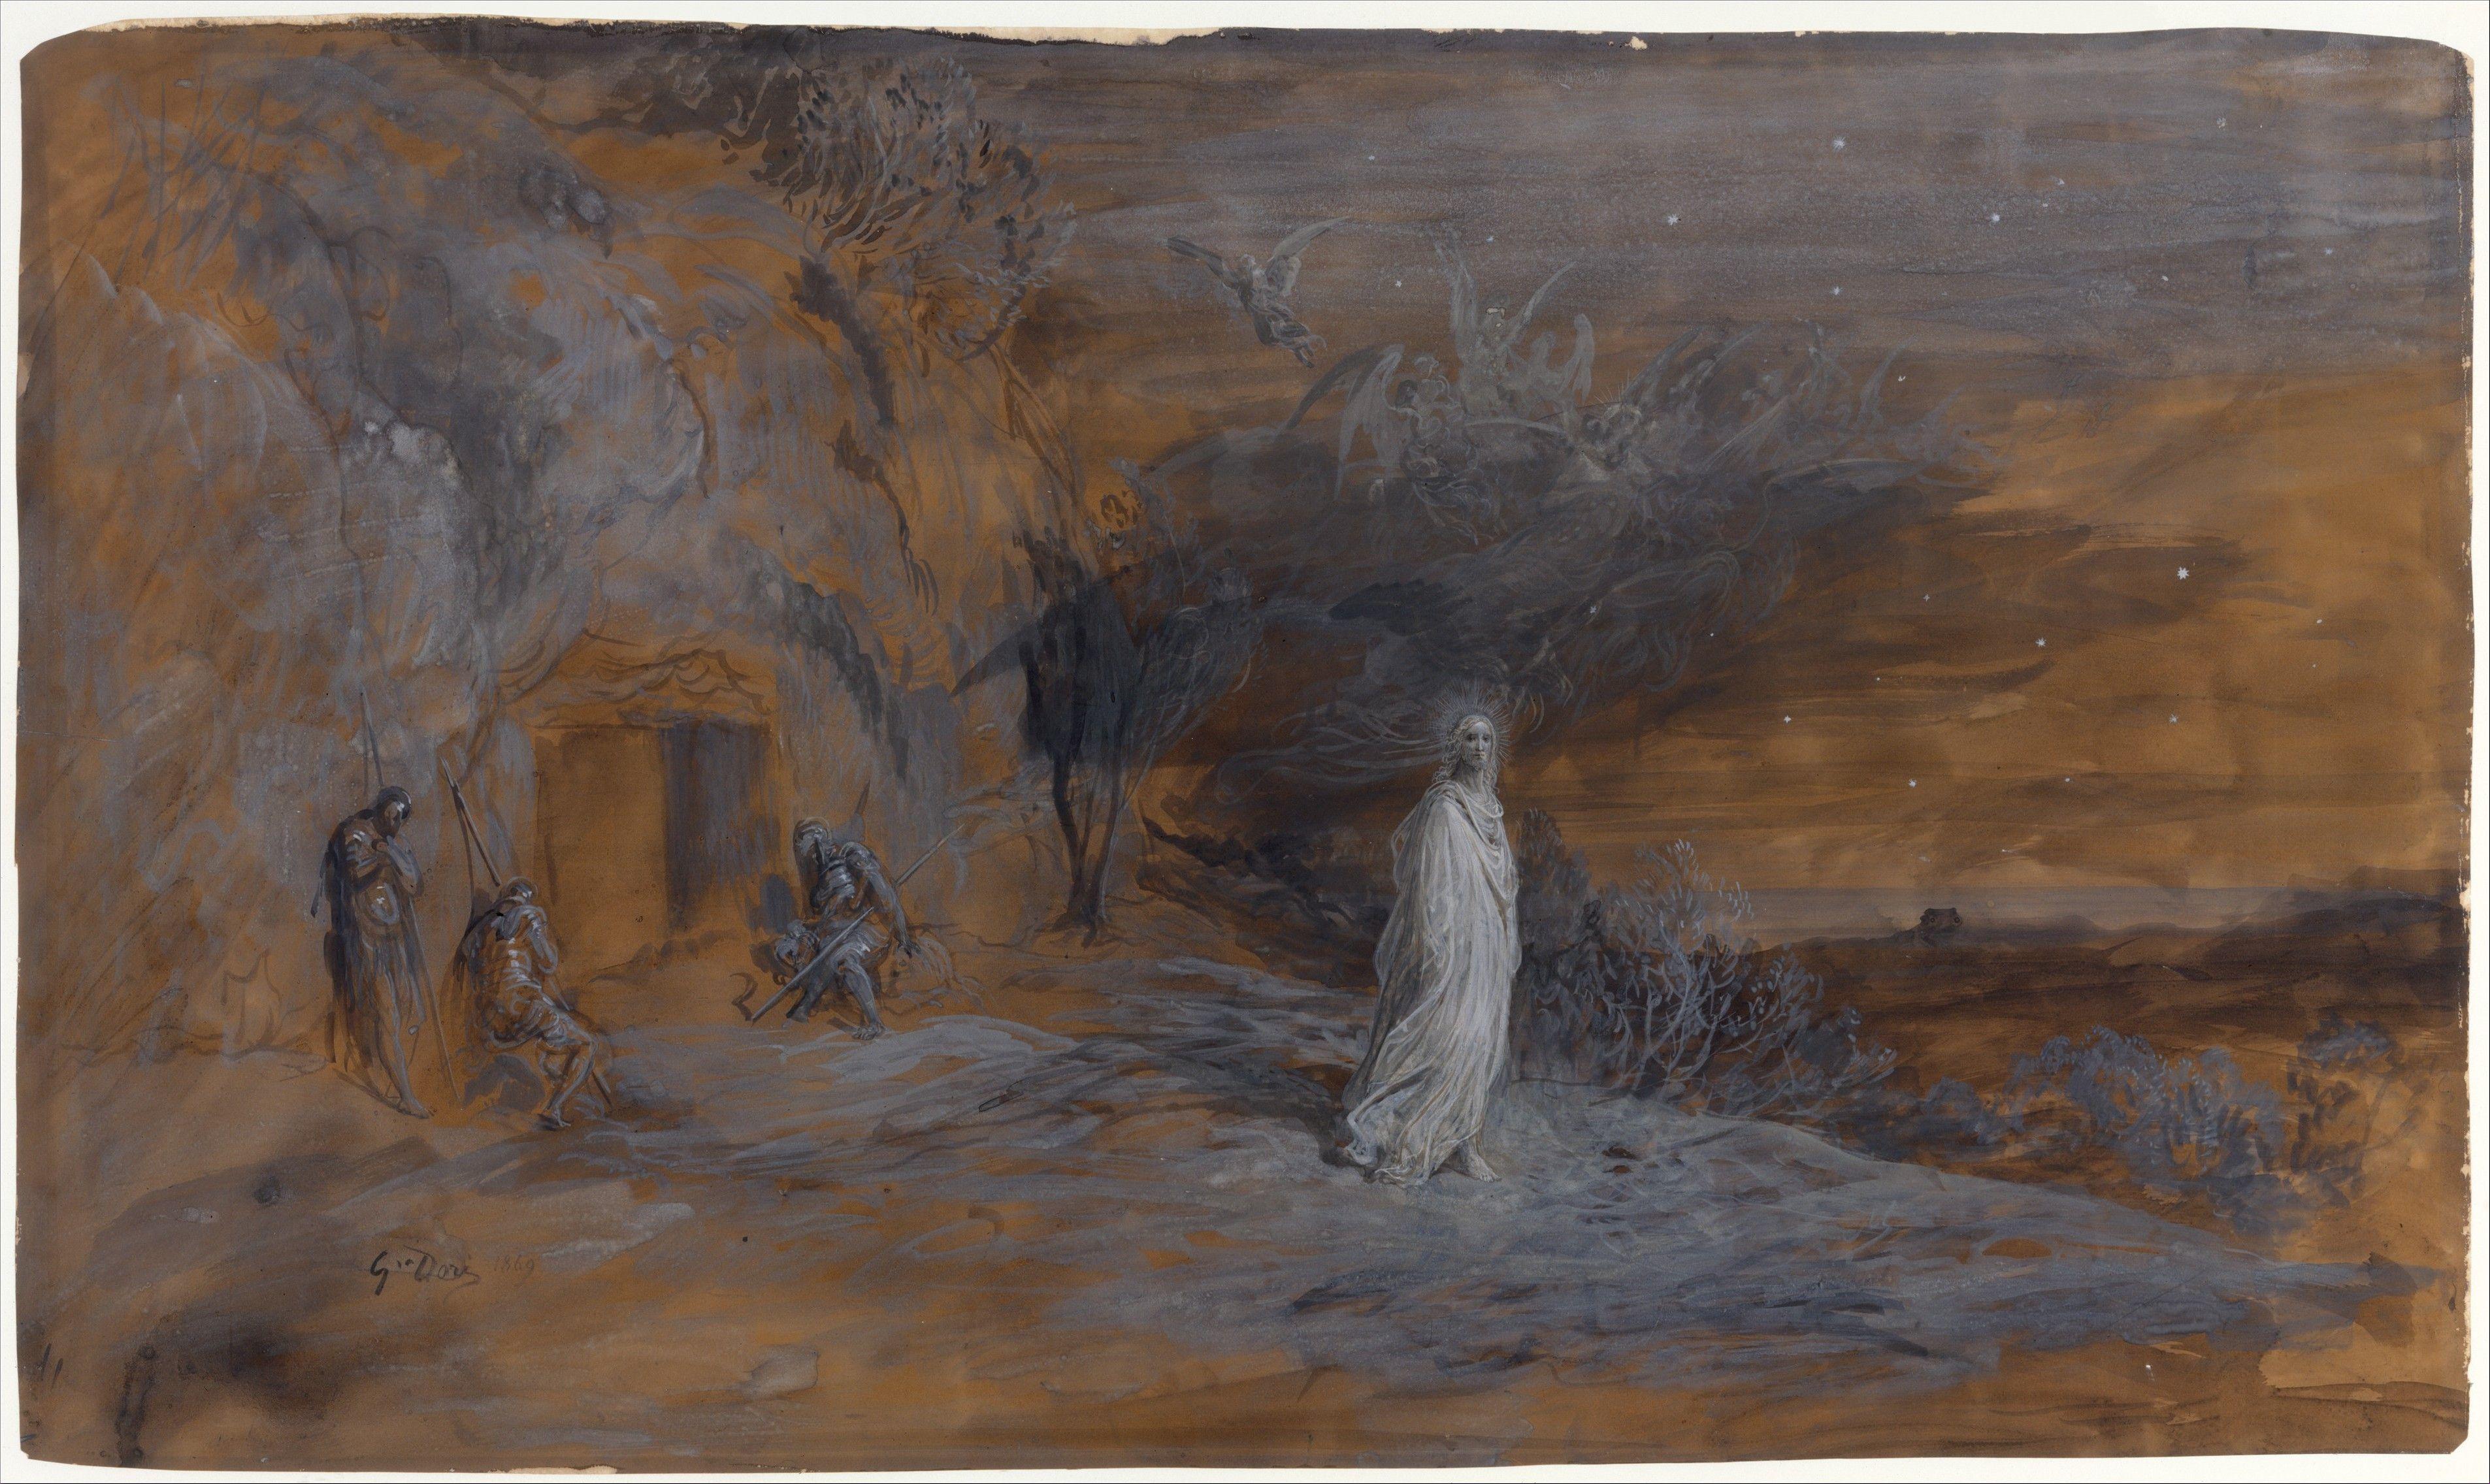 Le Christ Sortant Du Tombeau Artist Gustave Dore French Strasbourg Paris Date